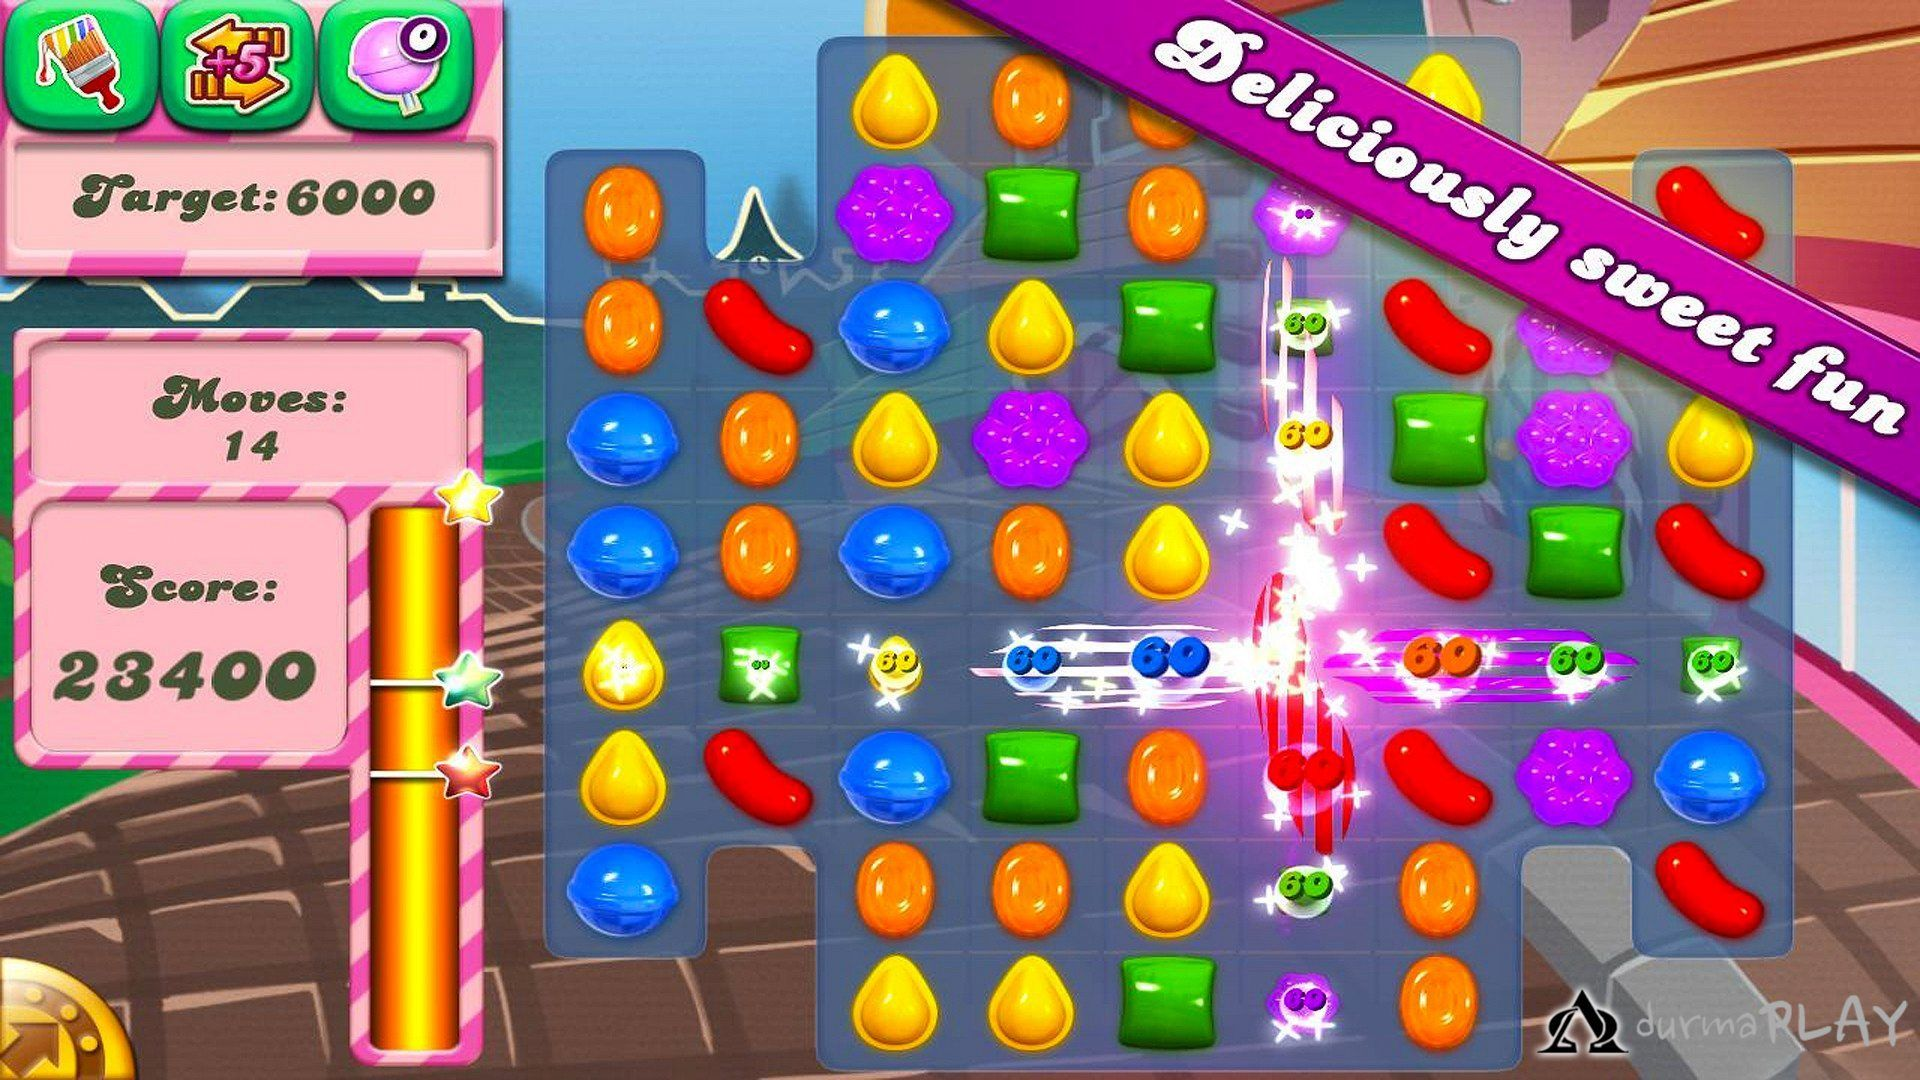 https://www.durmaplay.com/product/candy-crush-saga candy-crush-saga-facebook-oyun-kartlari-satin-al-screenshot-durmaplay-oyun-006.jpg (1920×1080)